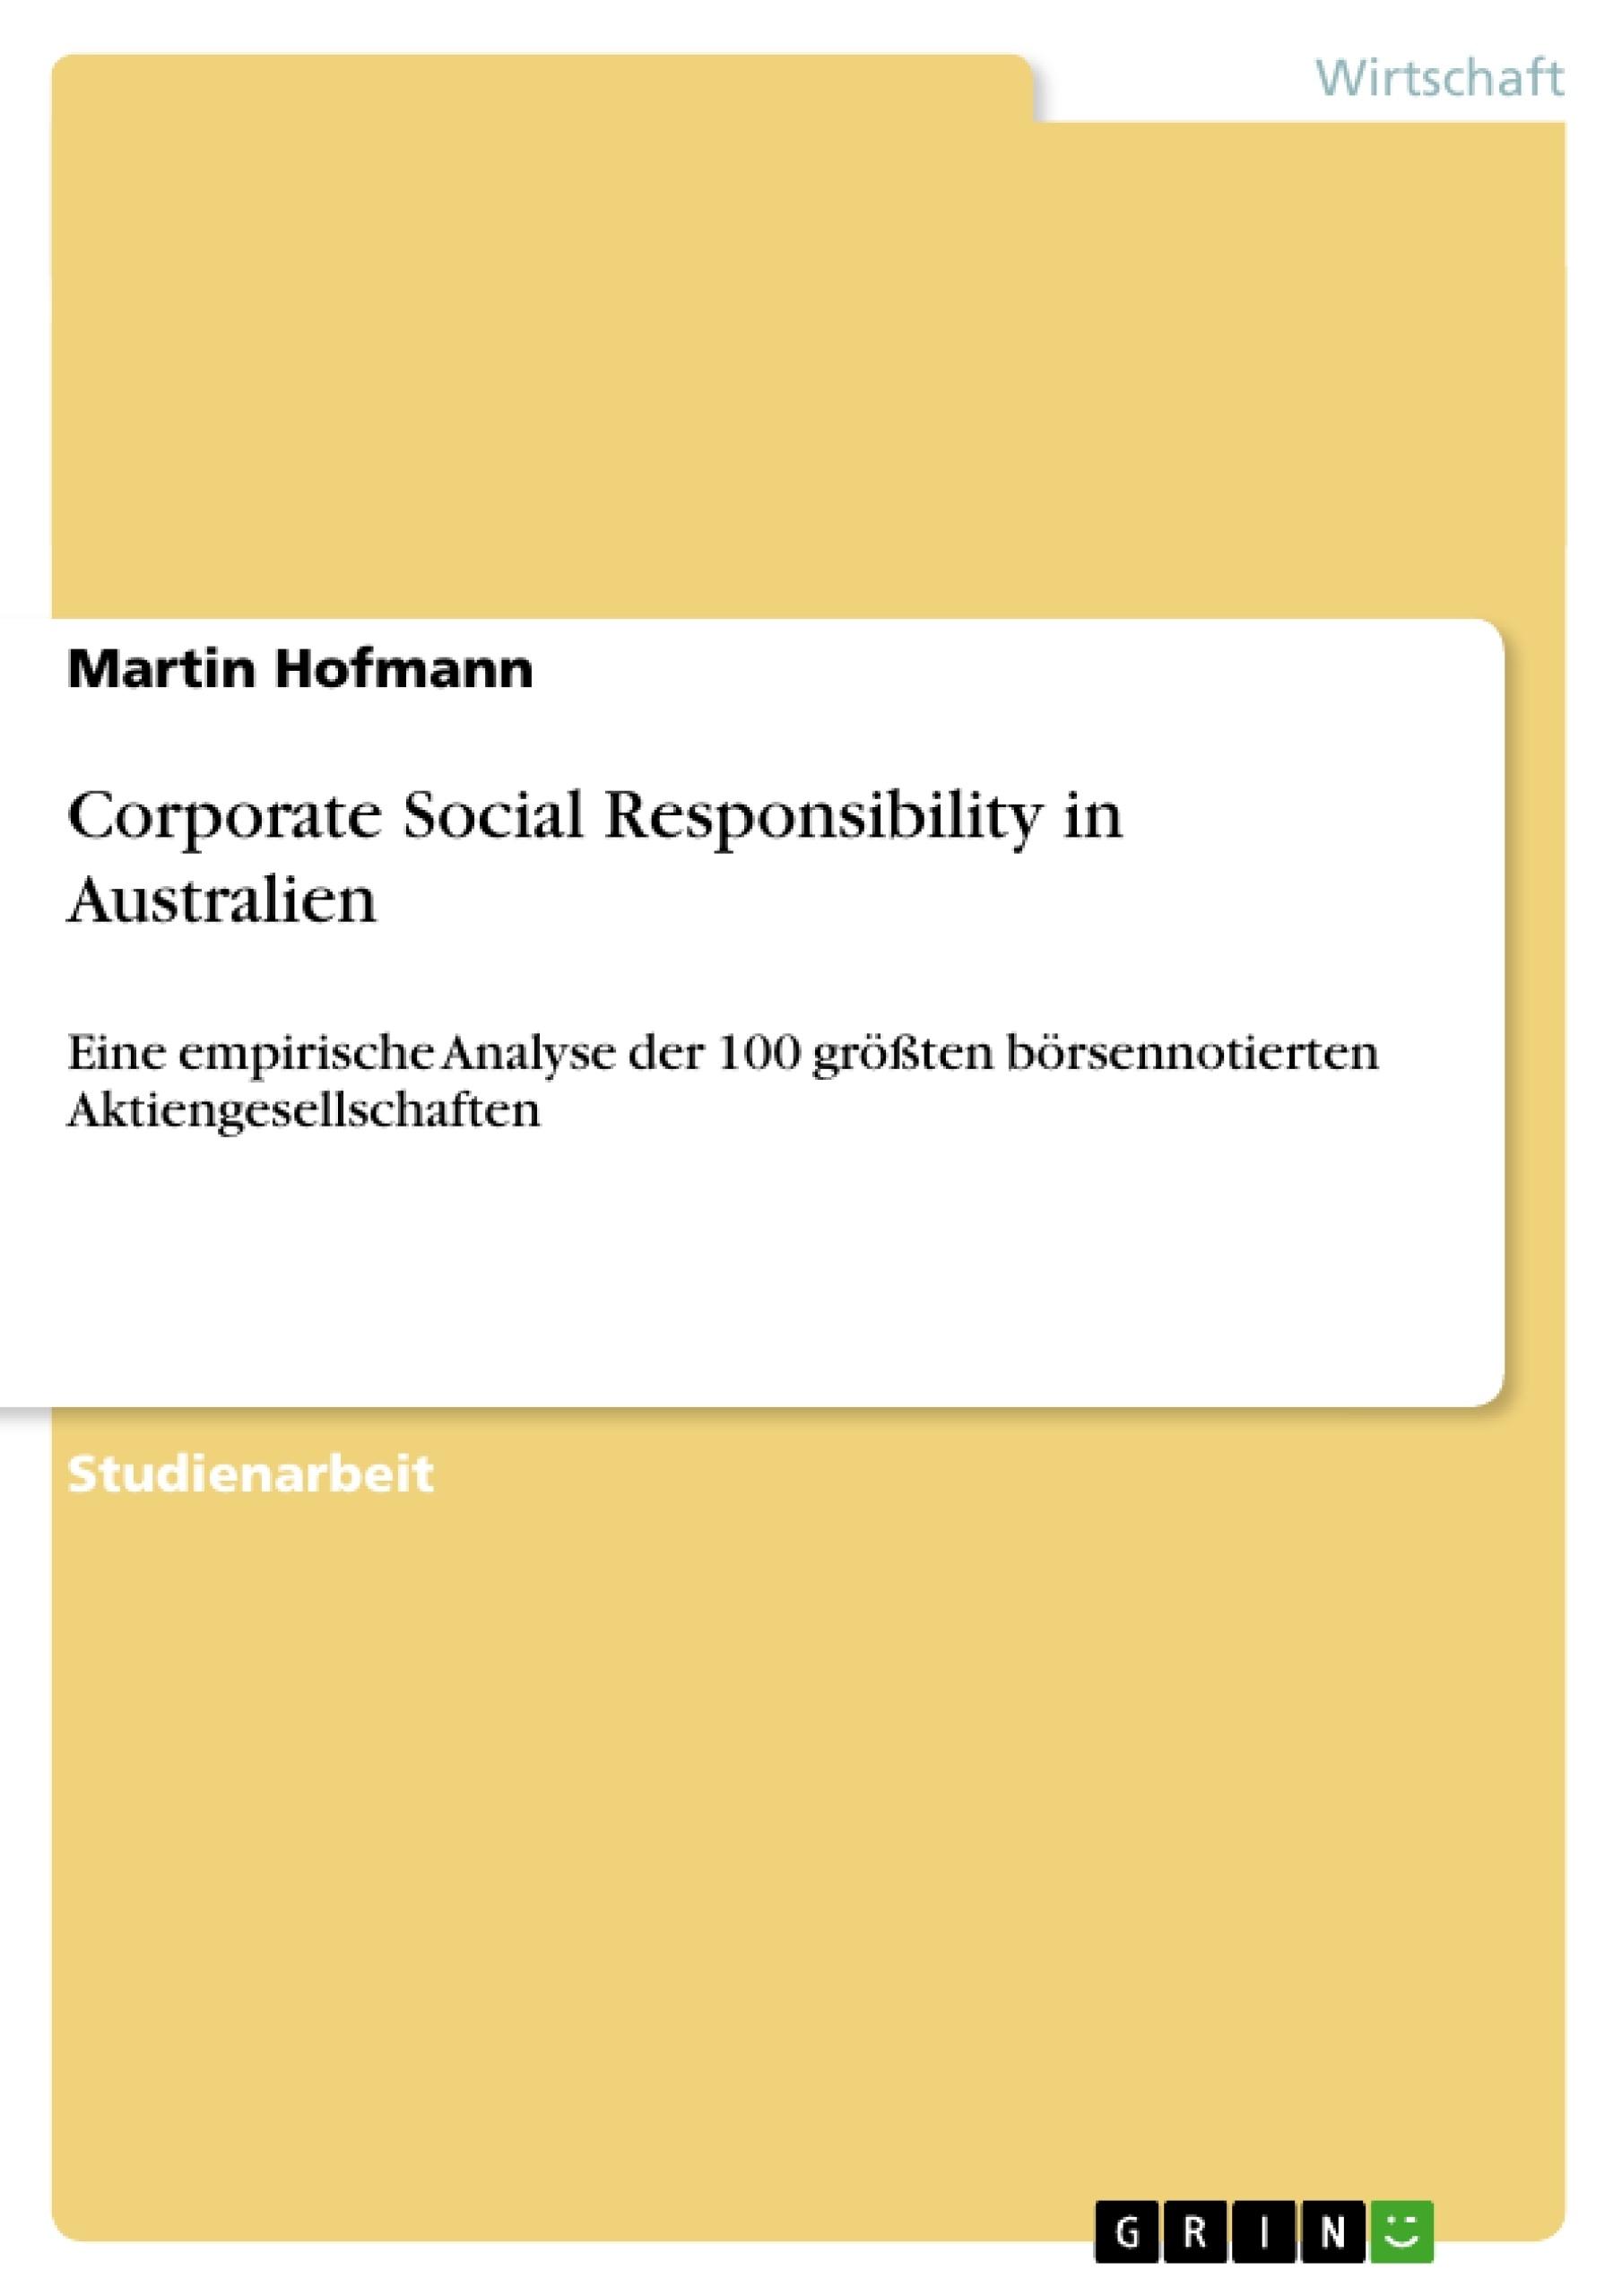 Titel: Corporate Social Responsibility in Australien